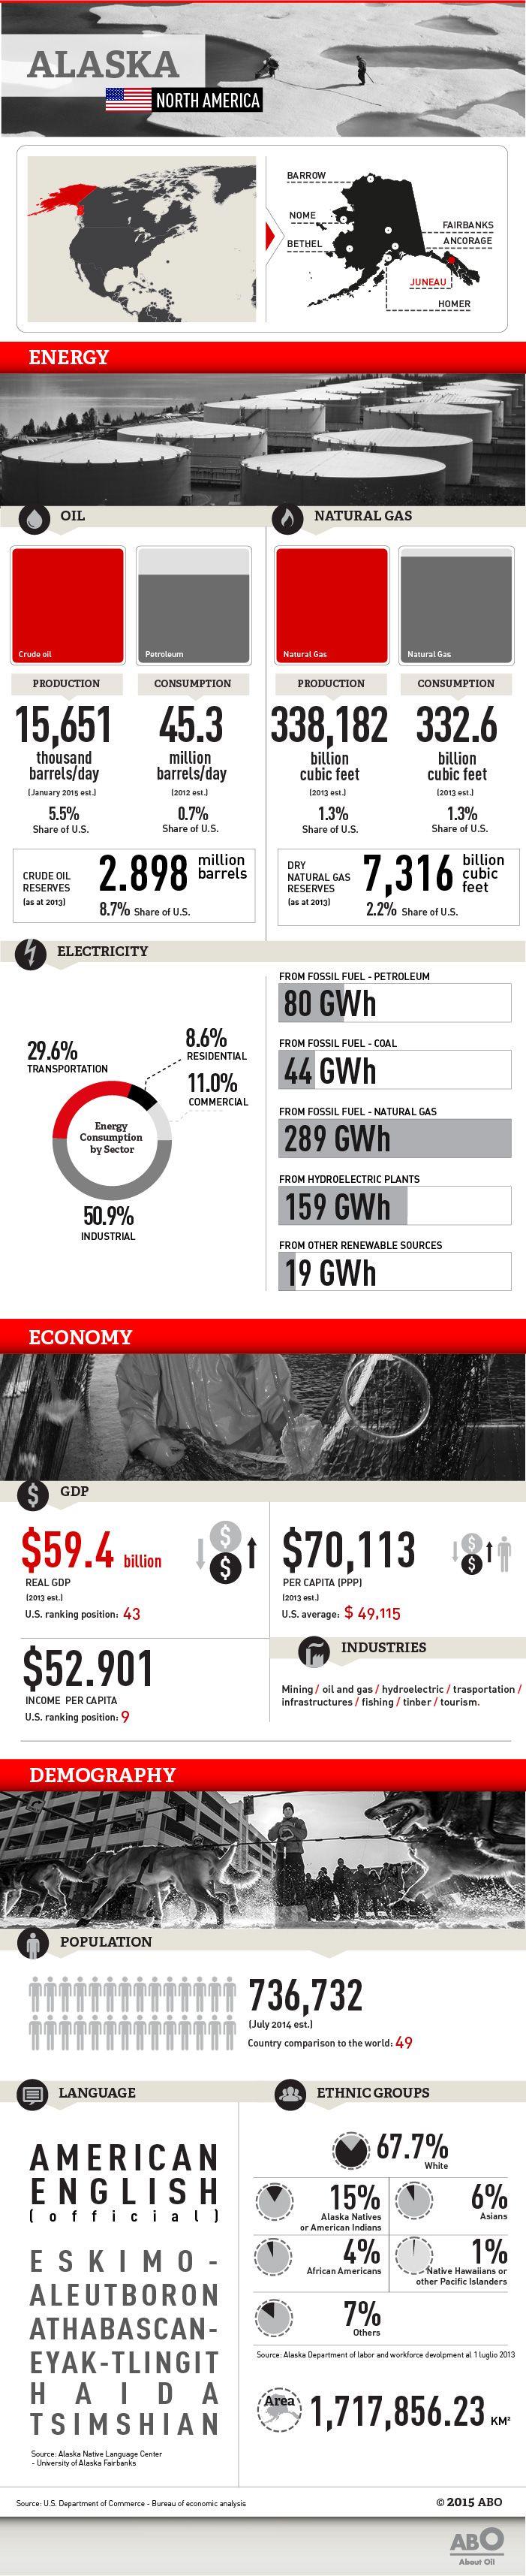 #Infographic about #Alaska #energy #oil #US http://www.abo.net/en_IT/publications/reportage/alaska_2015/alaska_2015.shtml